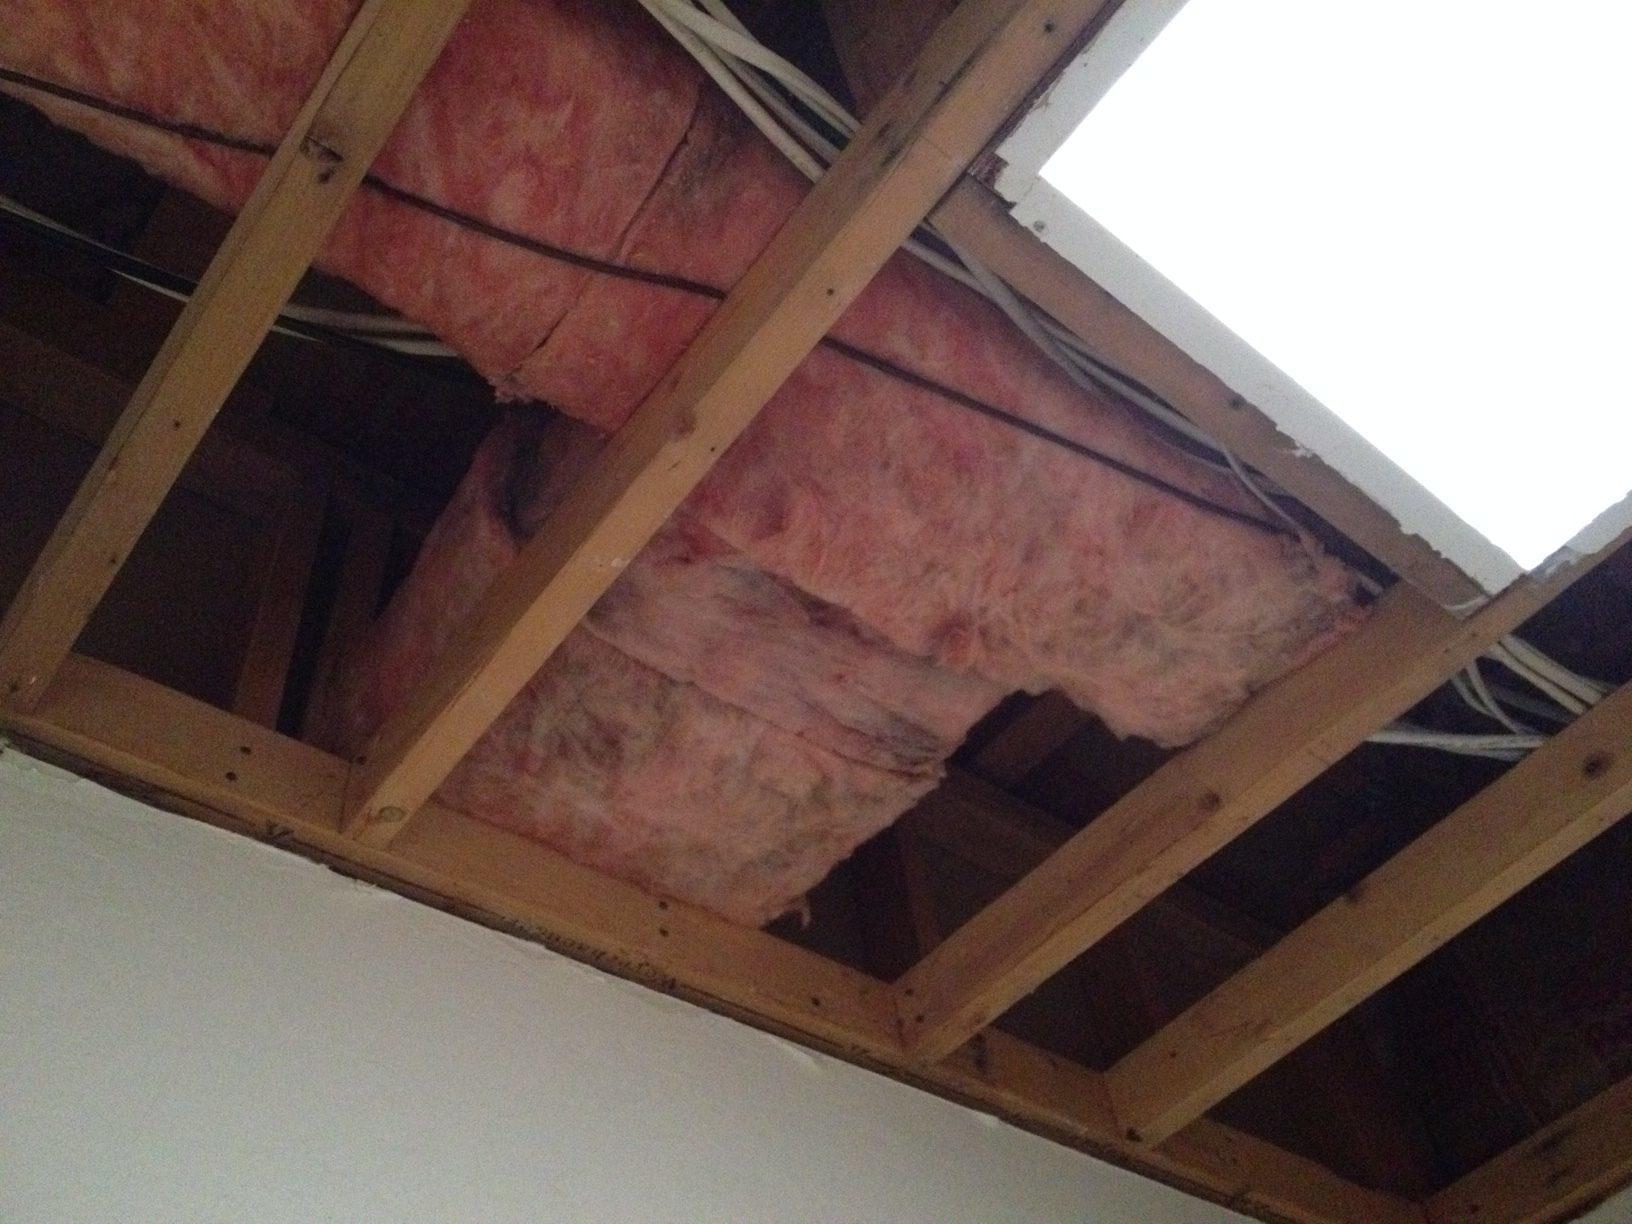 usaa homeowners insurance reviews photo - 1